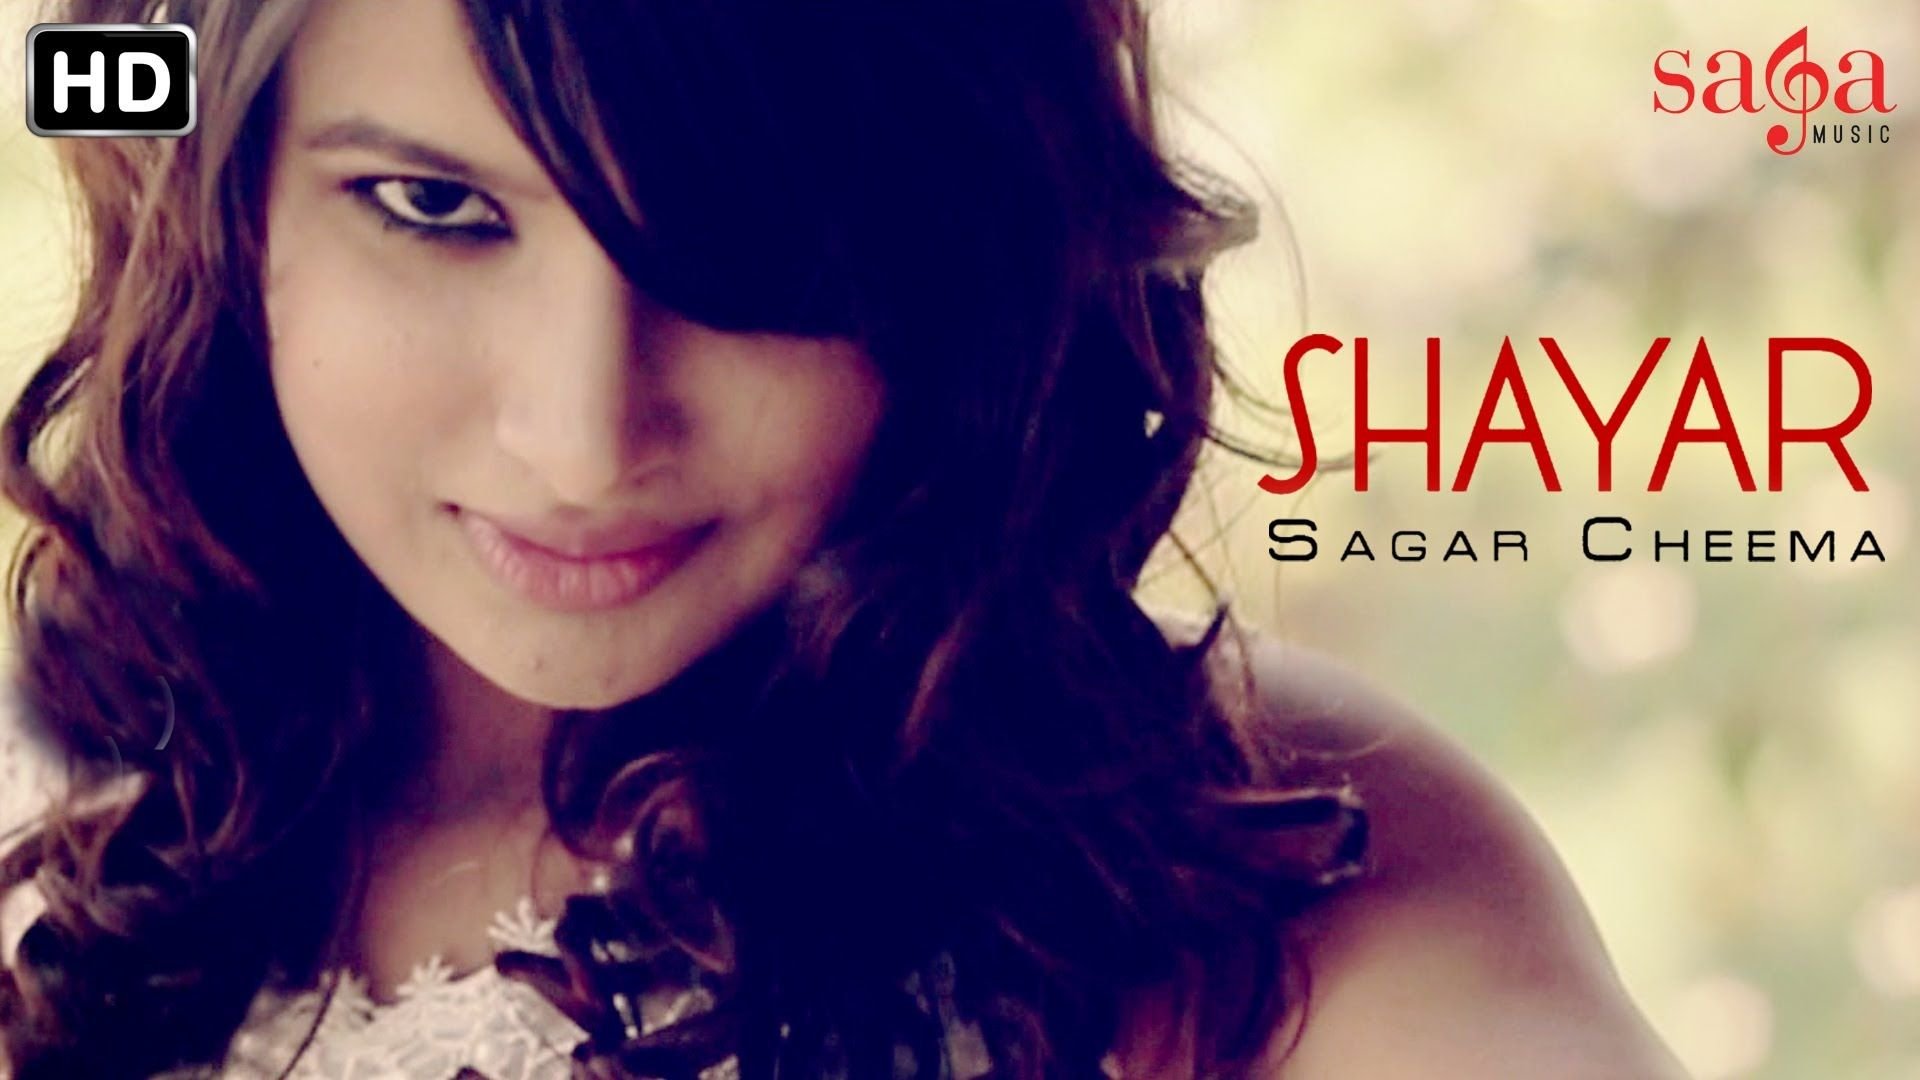 New Punjabi Songs List and Best New Punjabi Songs from DJ-Punjab